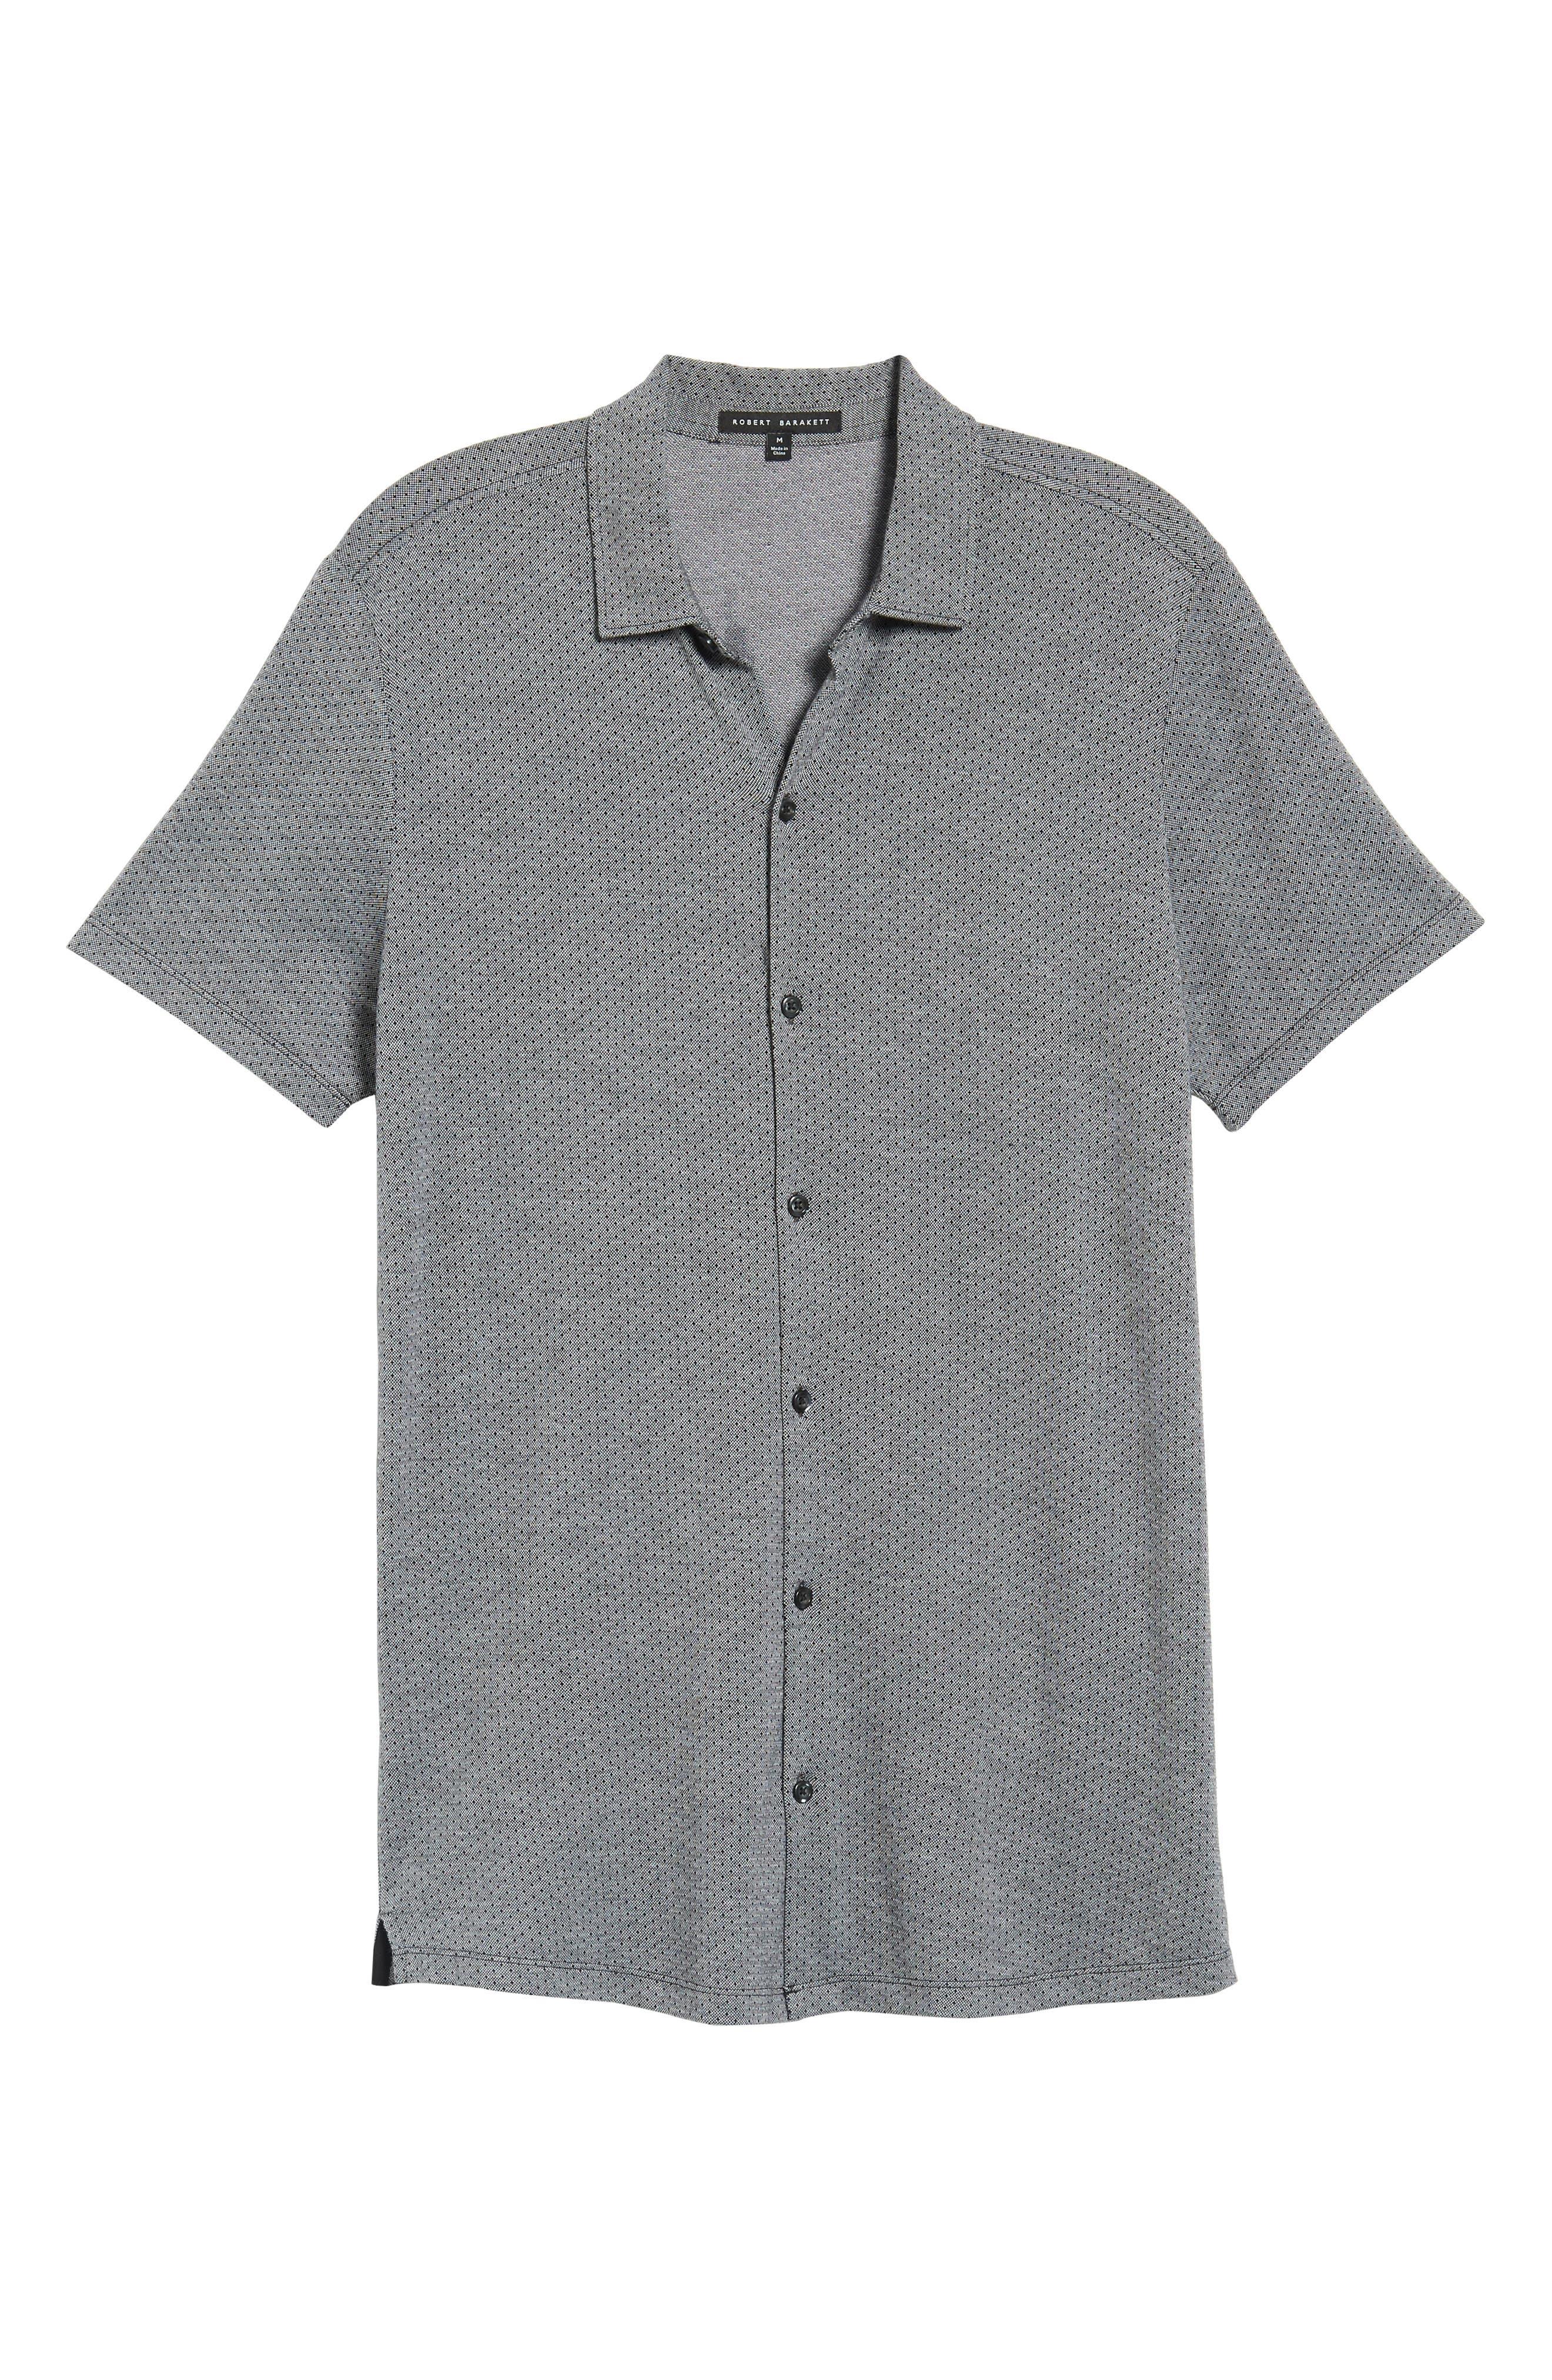 Johnson Sport Shirt,                             Alternate thumbnail 6, color,                             001